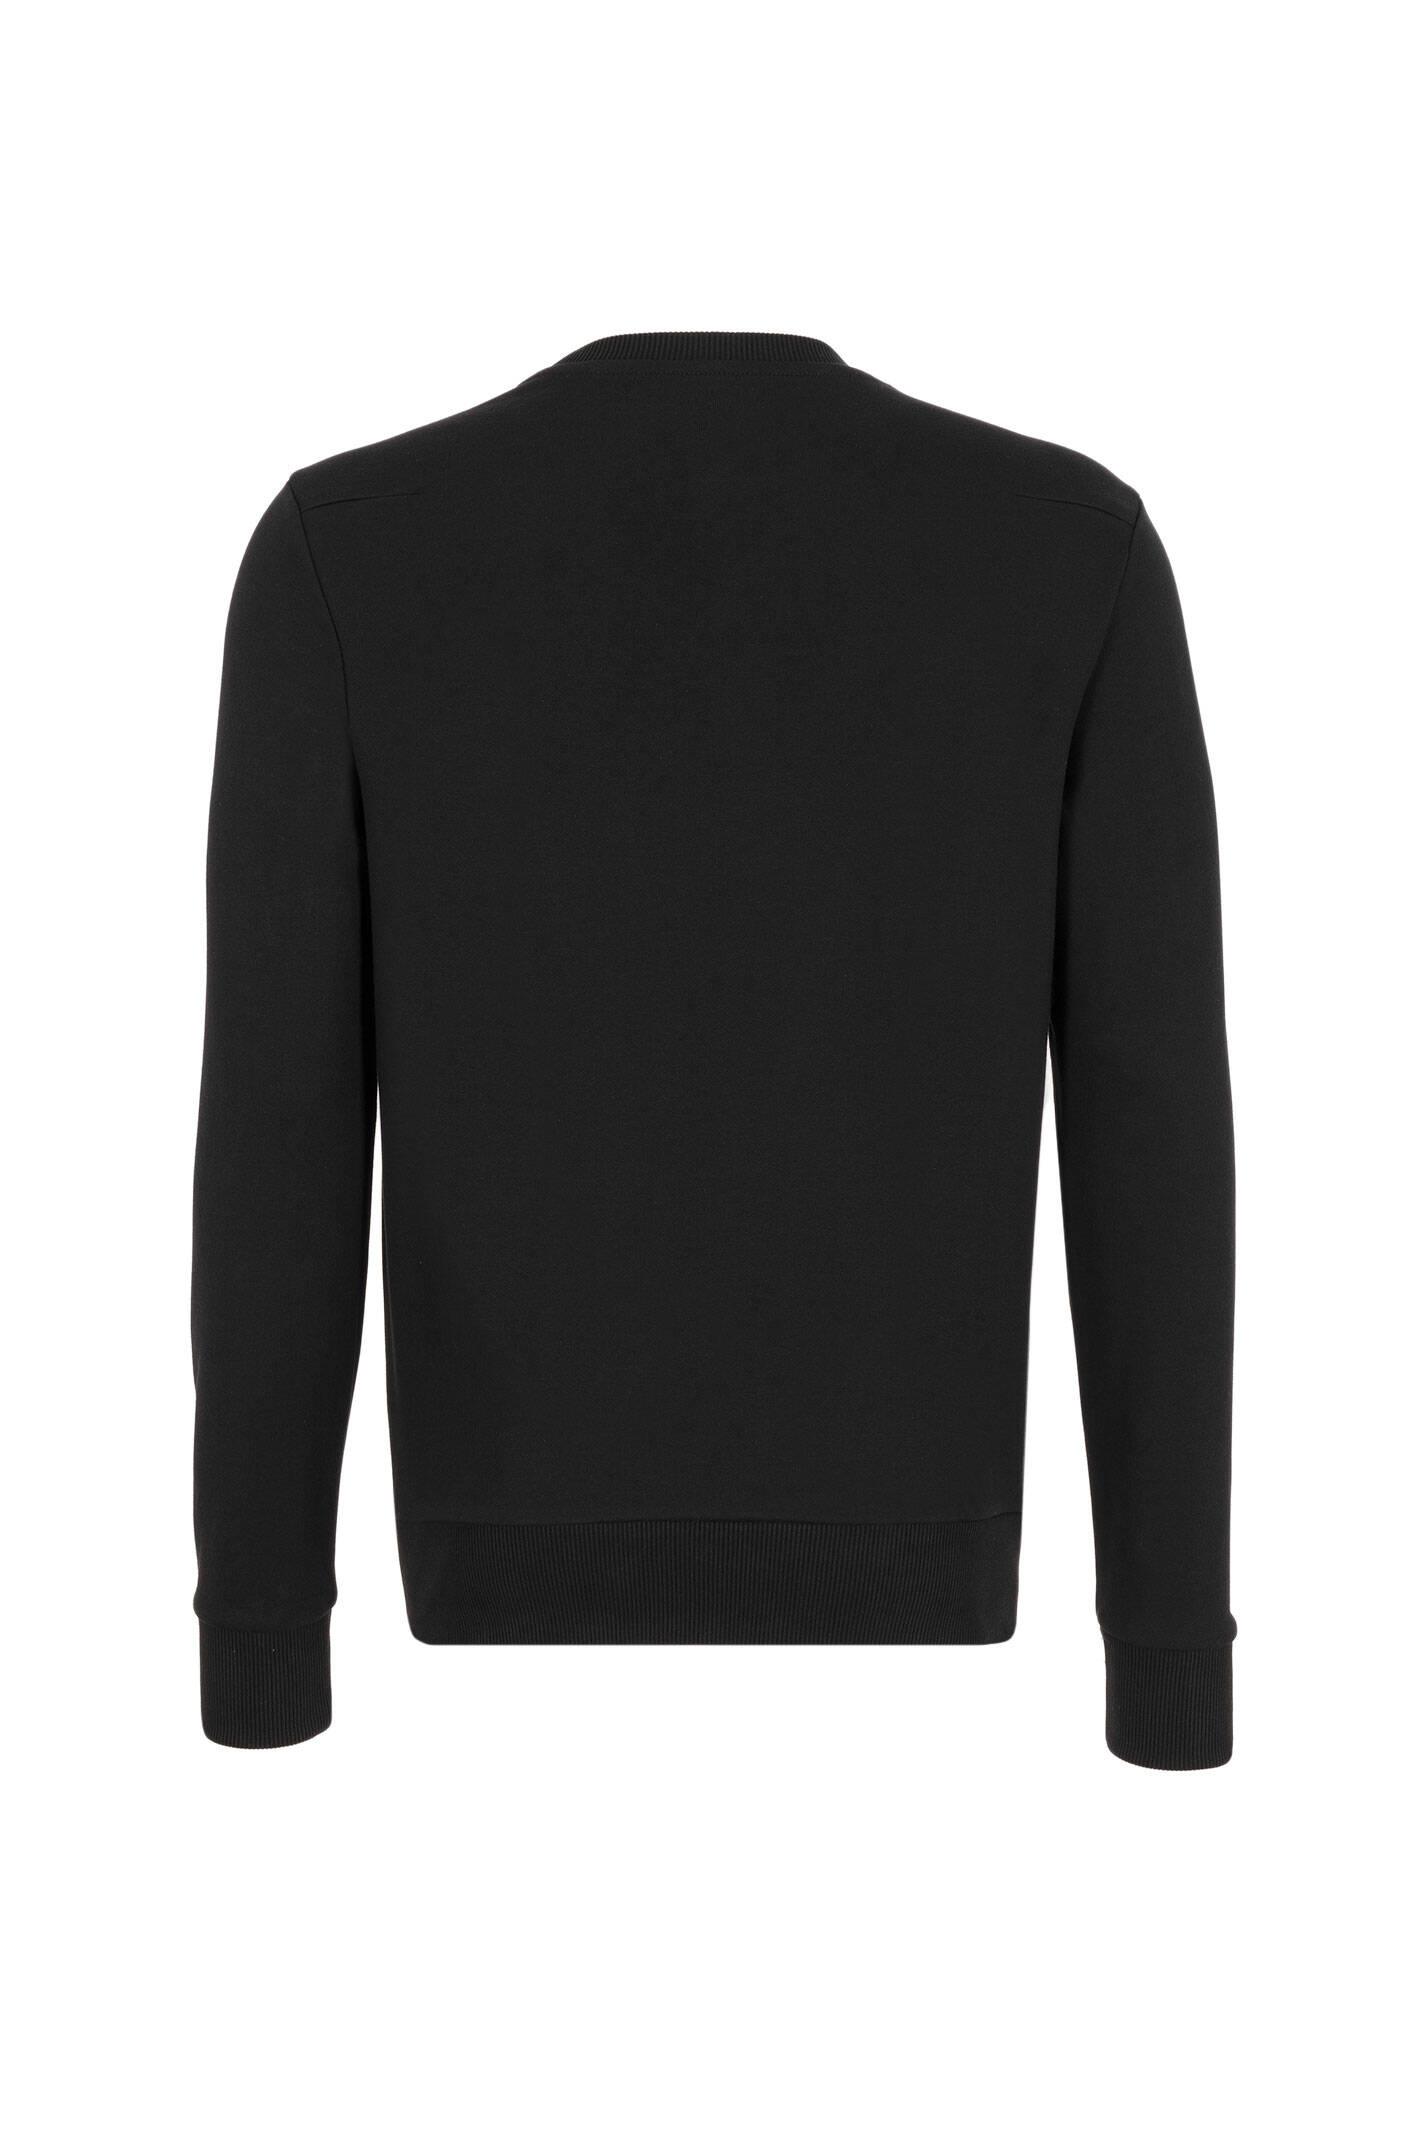 jerom unisex sweatshirt calvin klein jeans black. Black Bedroom Furniture Sets. Home Design Ideas